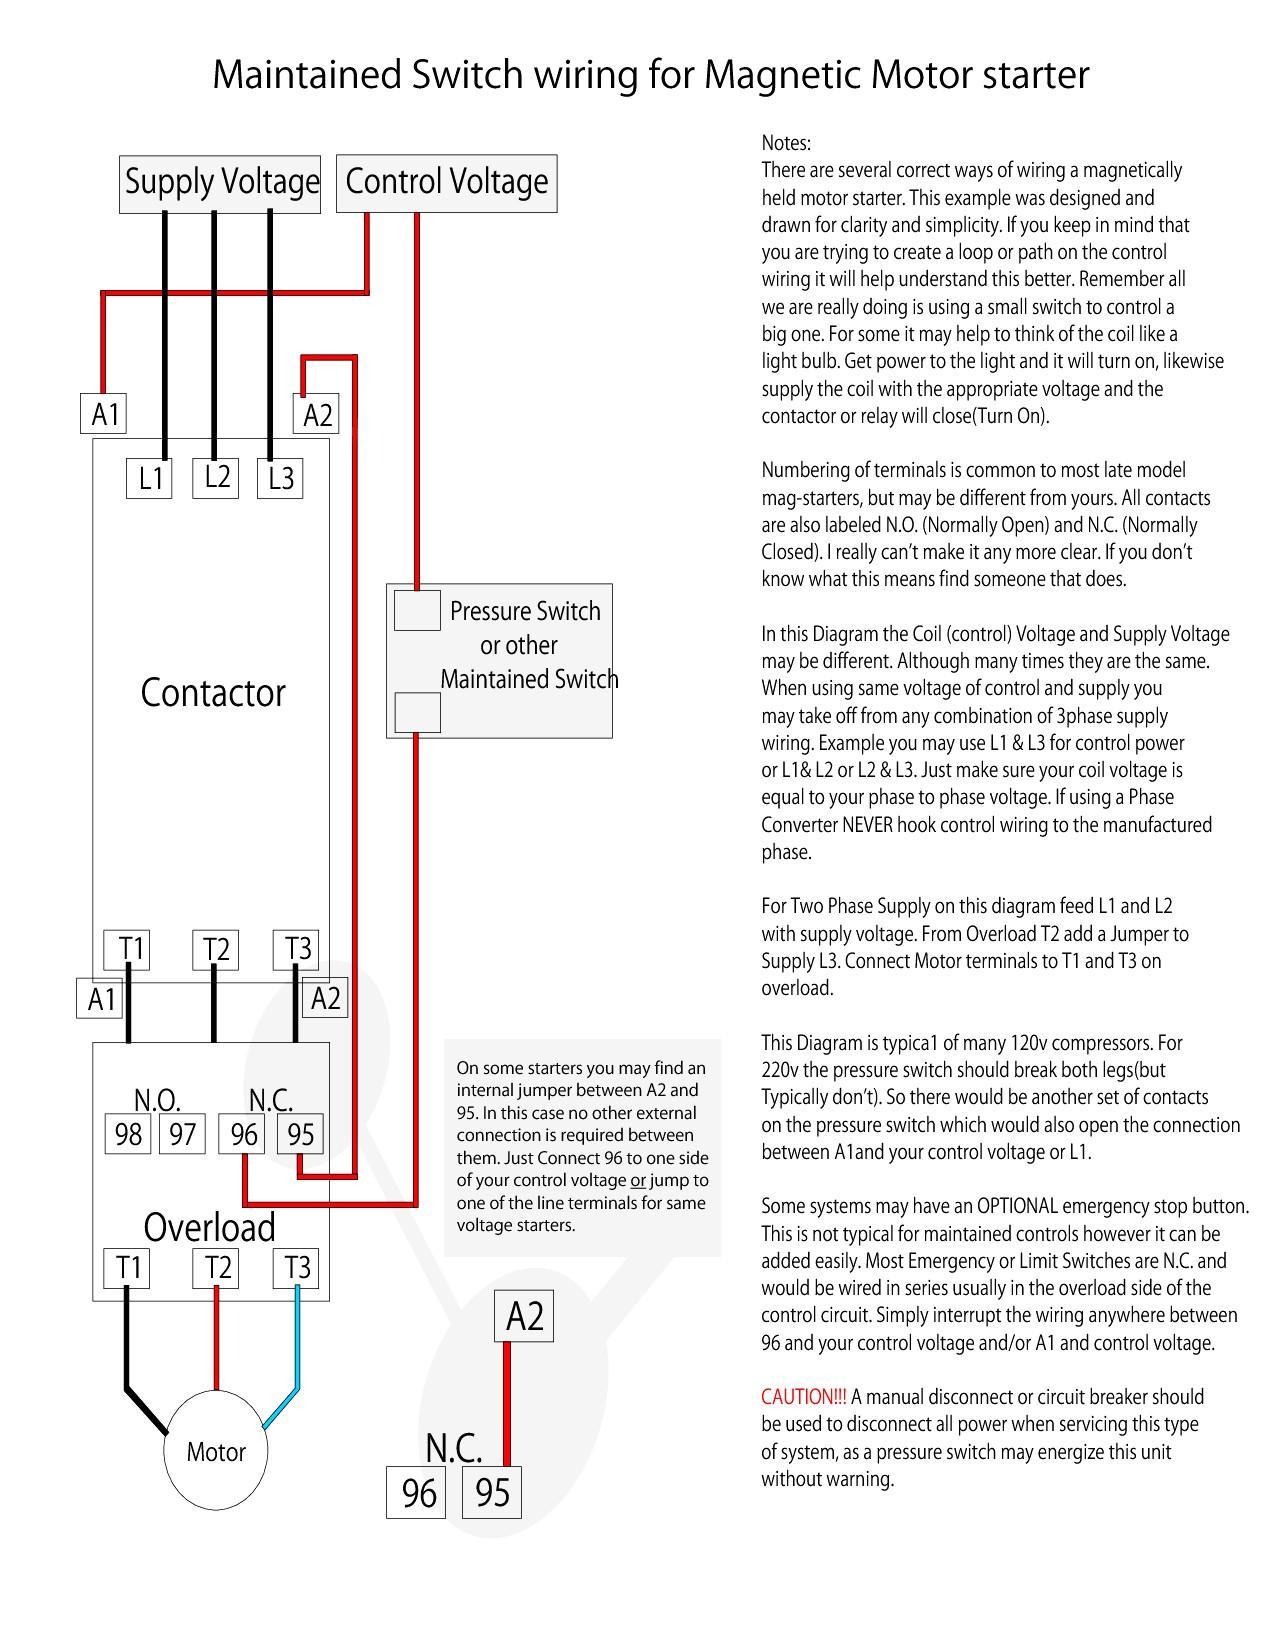 Cutler Hammer Motor Starter Diagrams - Wiring Diagram Data on